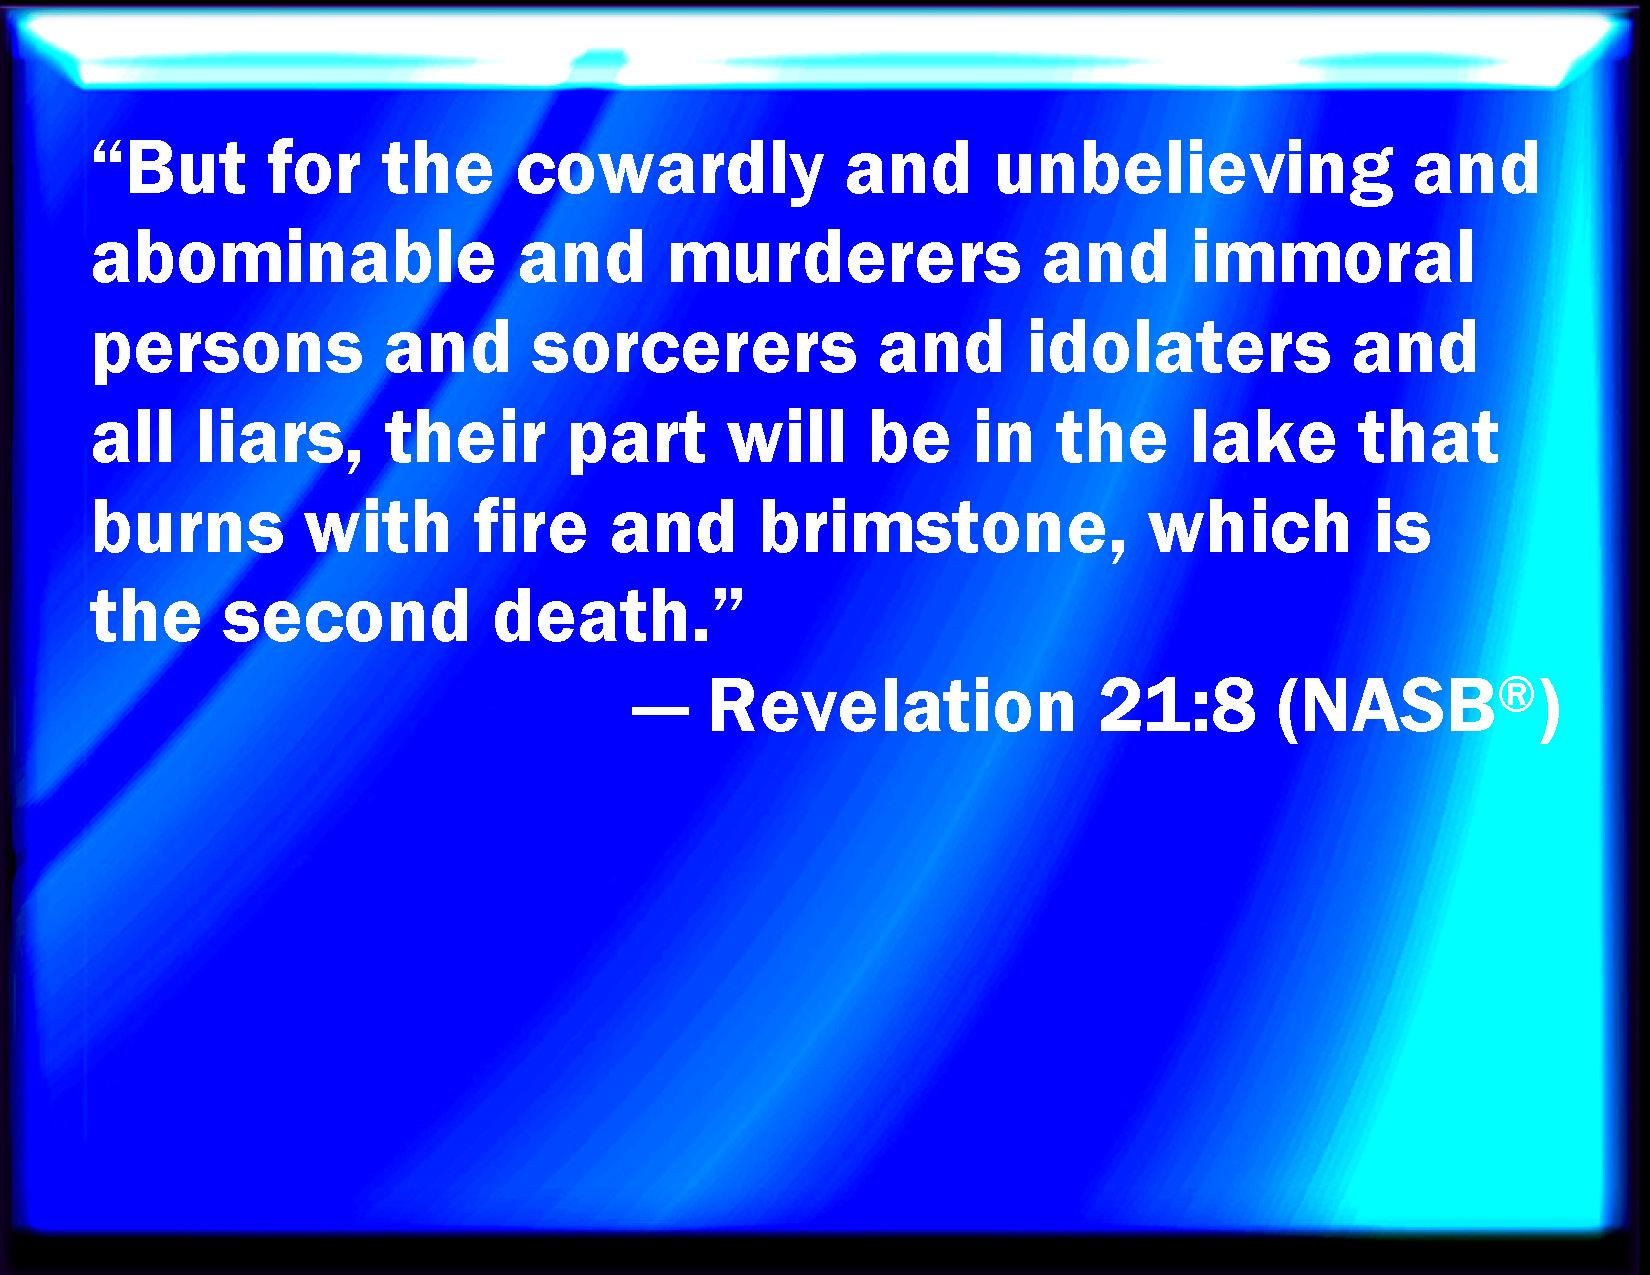 revelation 21 8